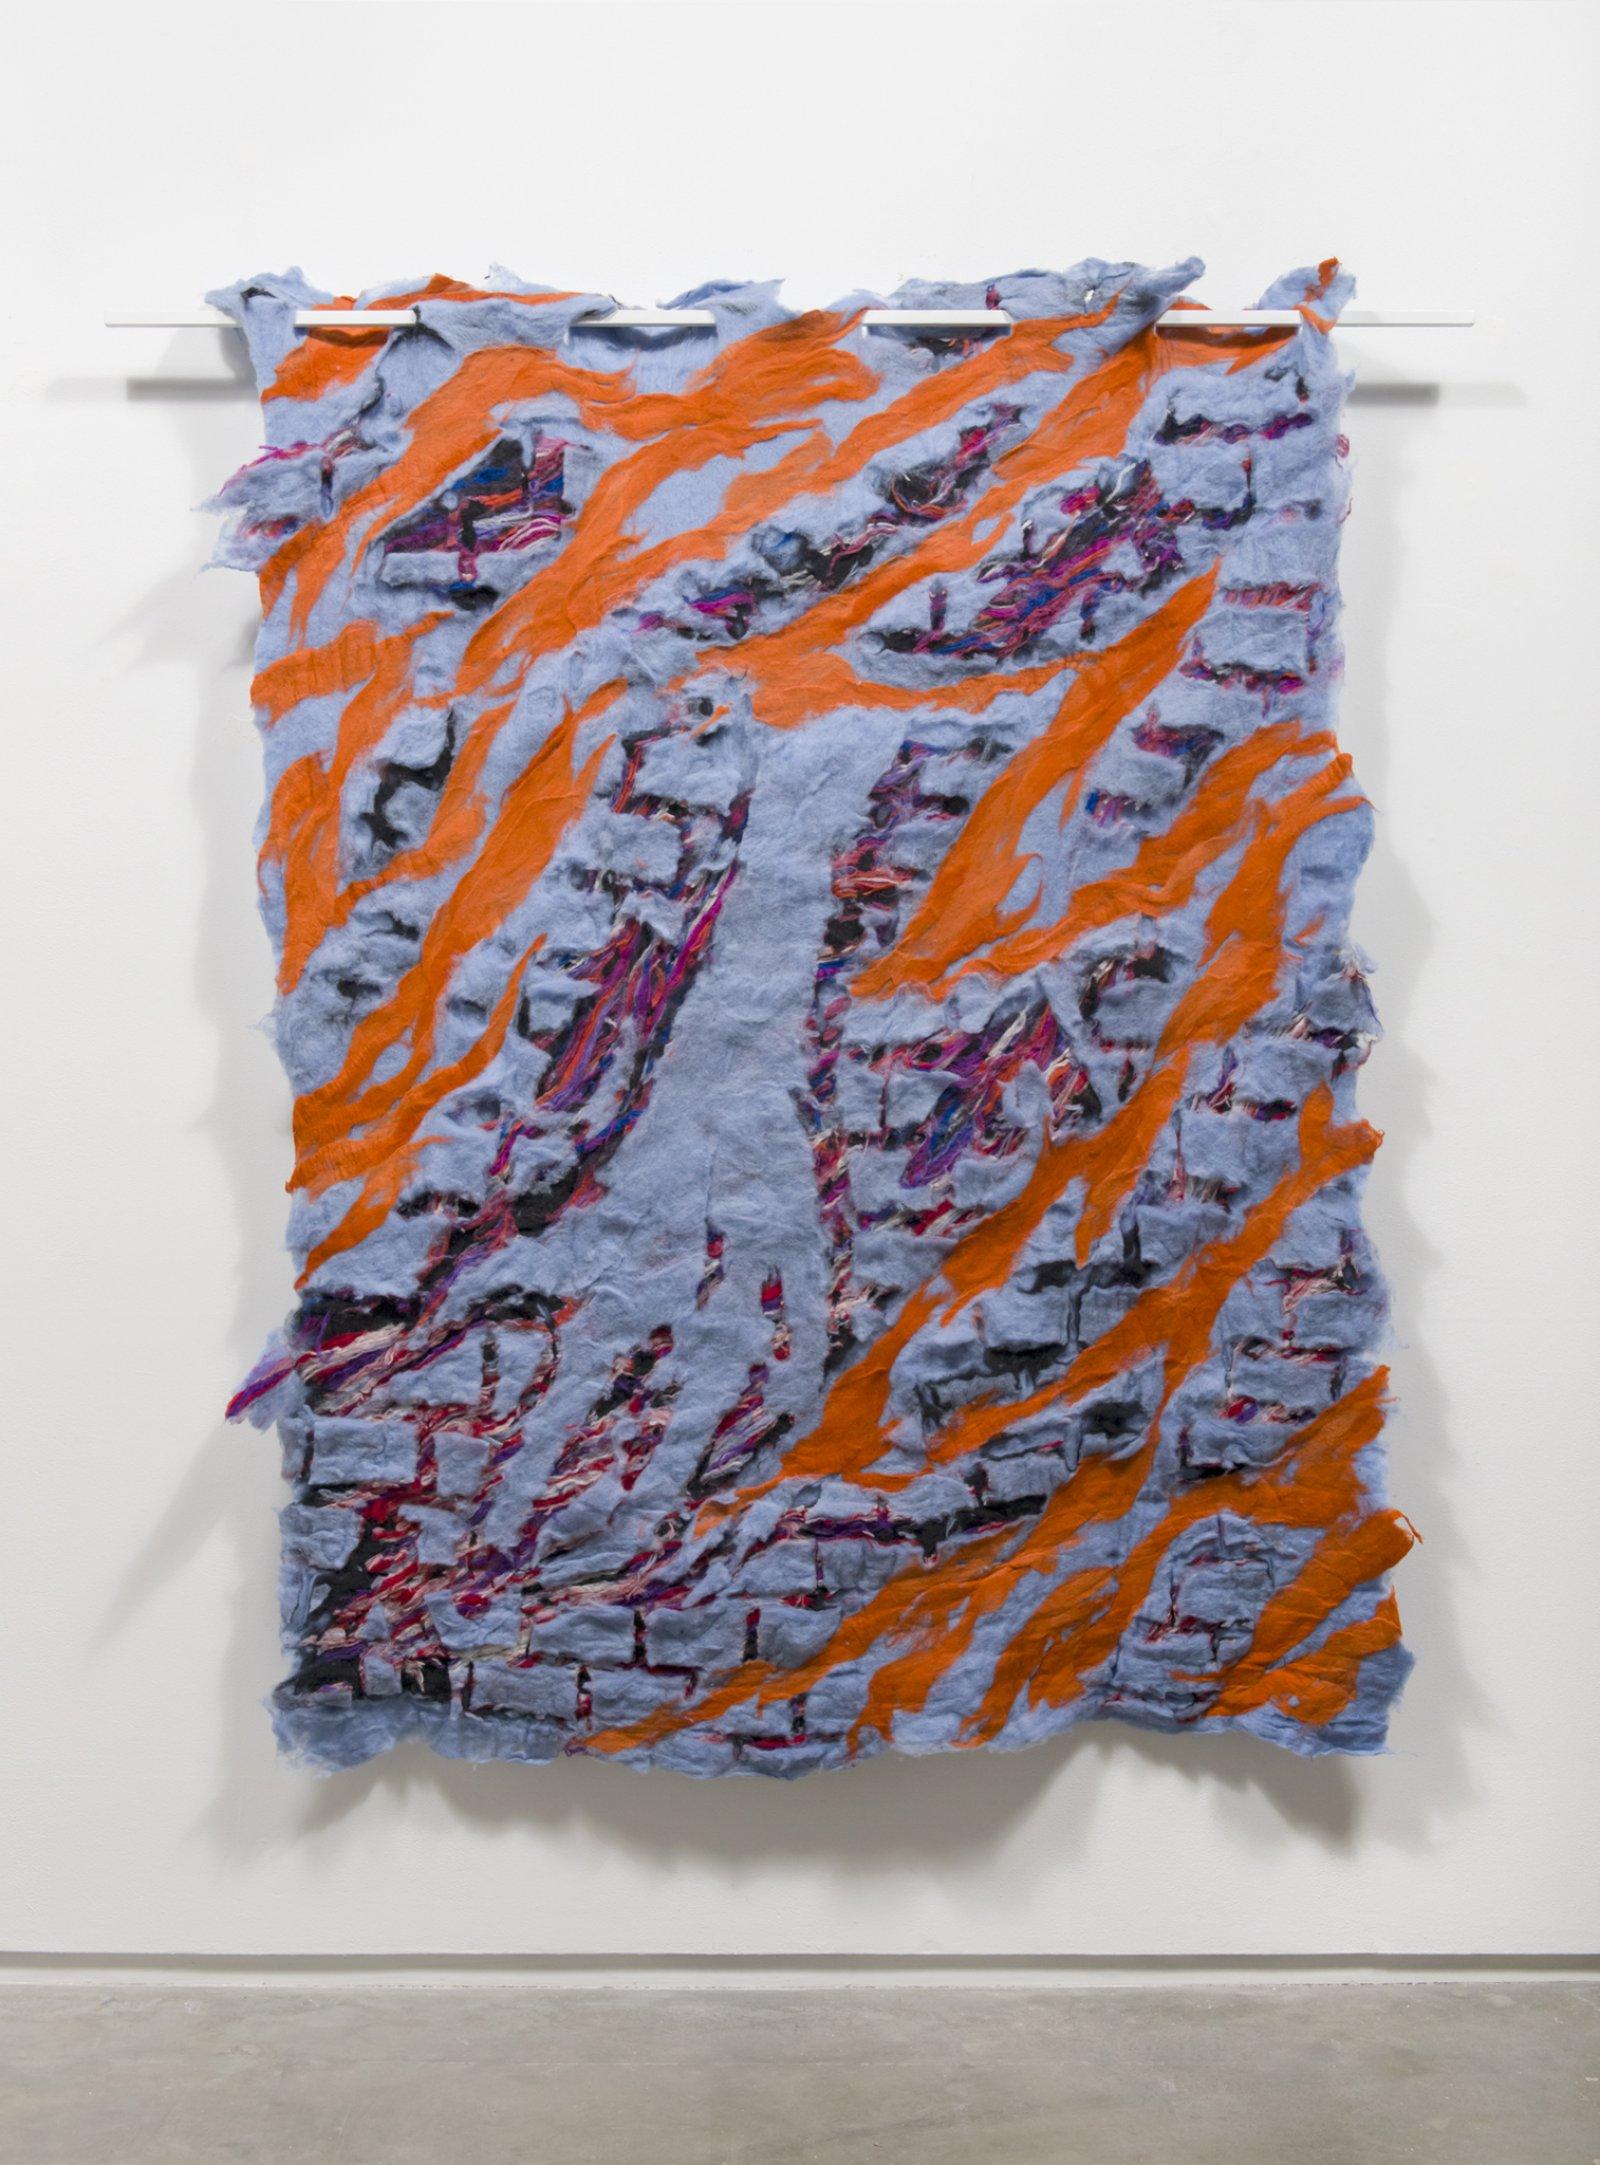 Rebecca Brewer,Carroll, 2016, wool felt, painted metal, 84 x 77 x 8 in. (213 x 196 x 20 cm)